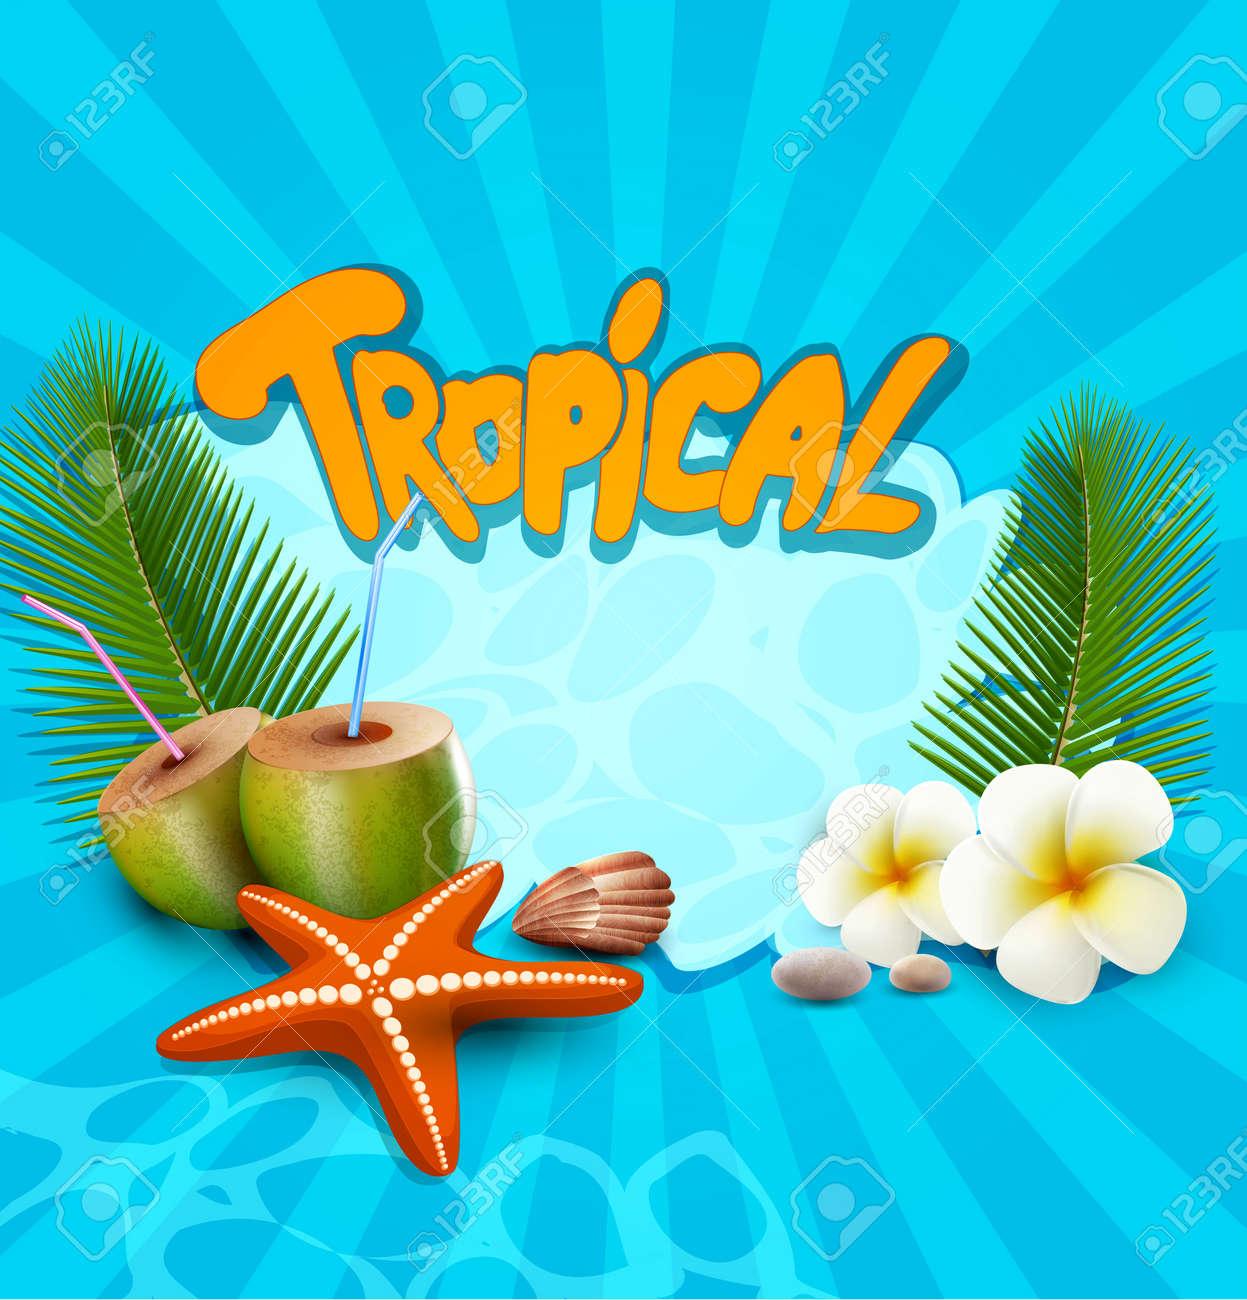 tropical banner with seashells, starfish Stock Vector - 20747700